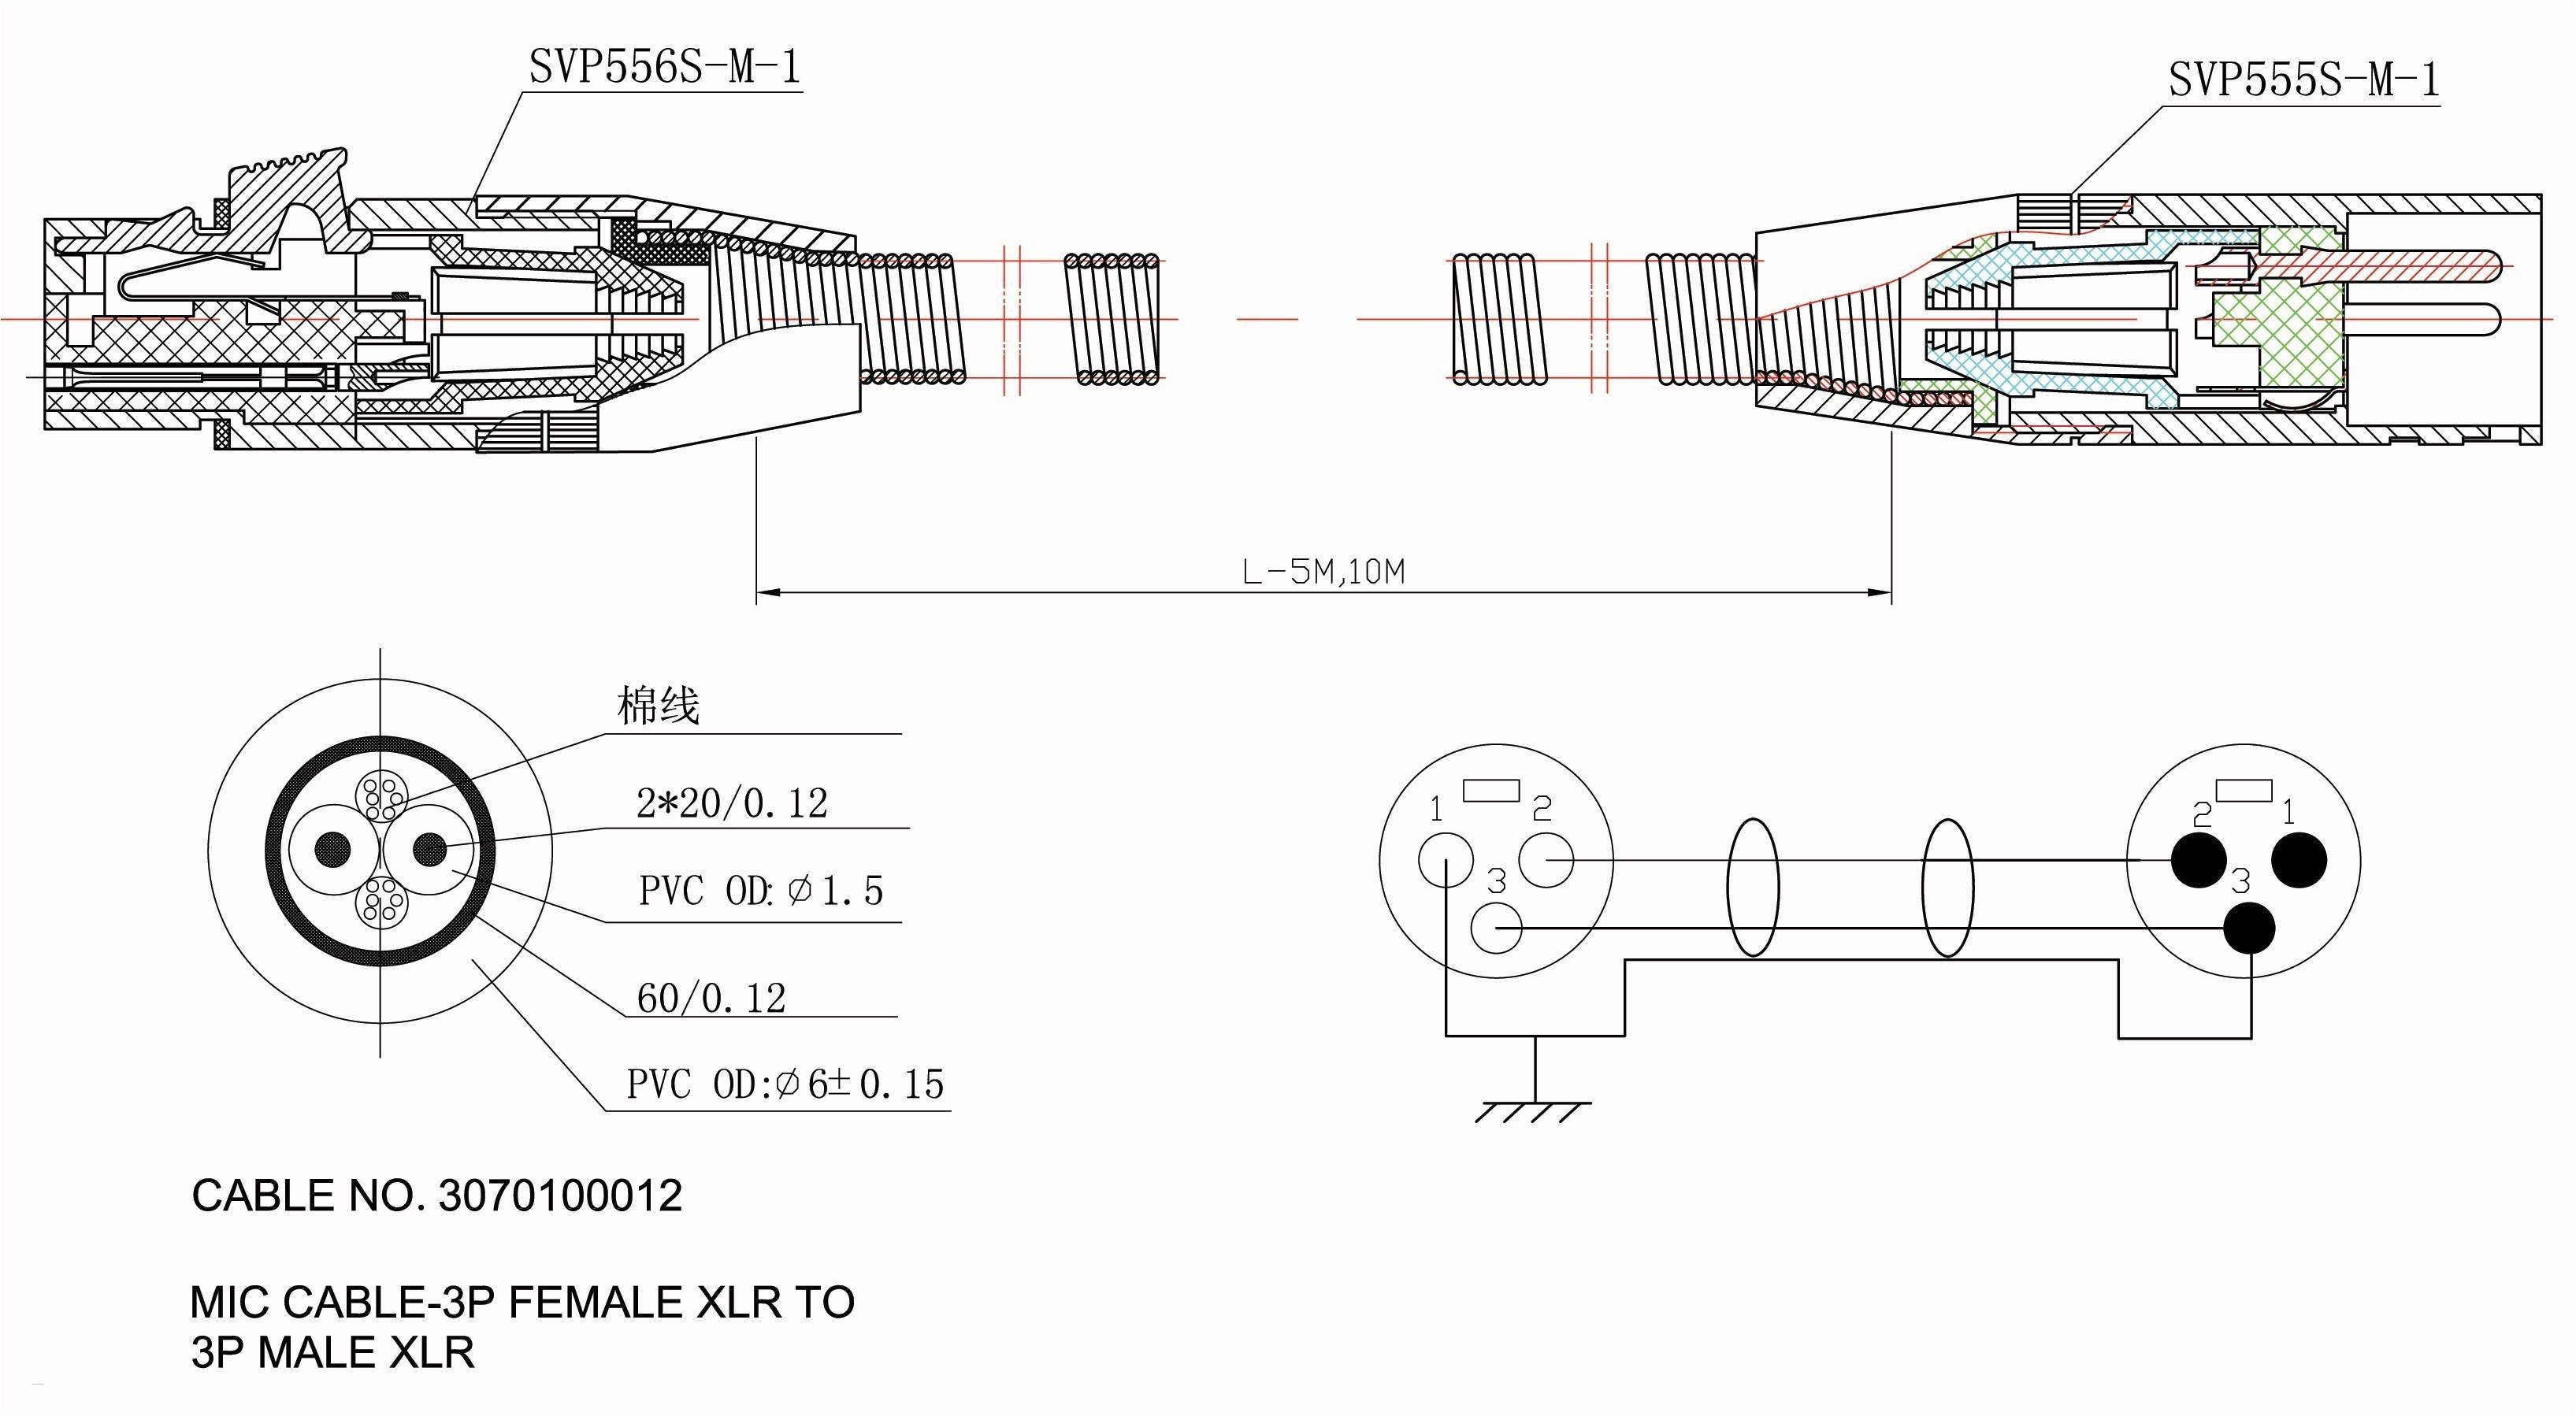 Pentair Challenger Pump Wiring Diagram Wiring Diagram Pentair Challenger Wiring Diagram Centre